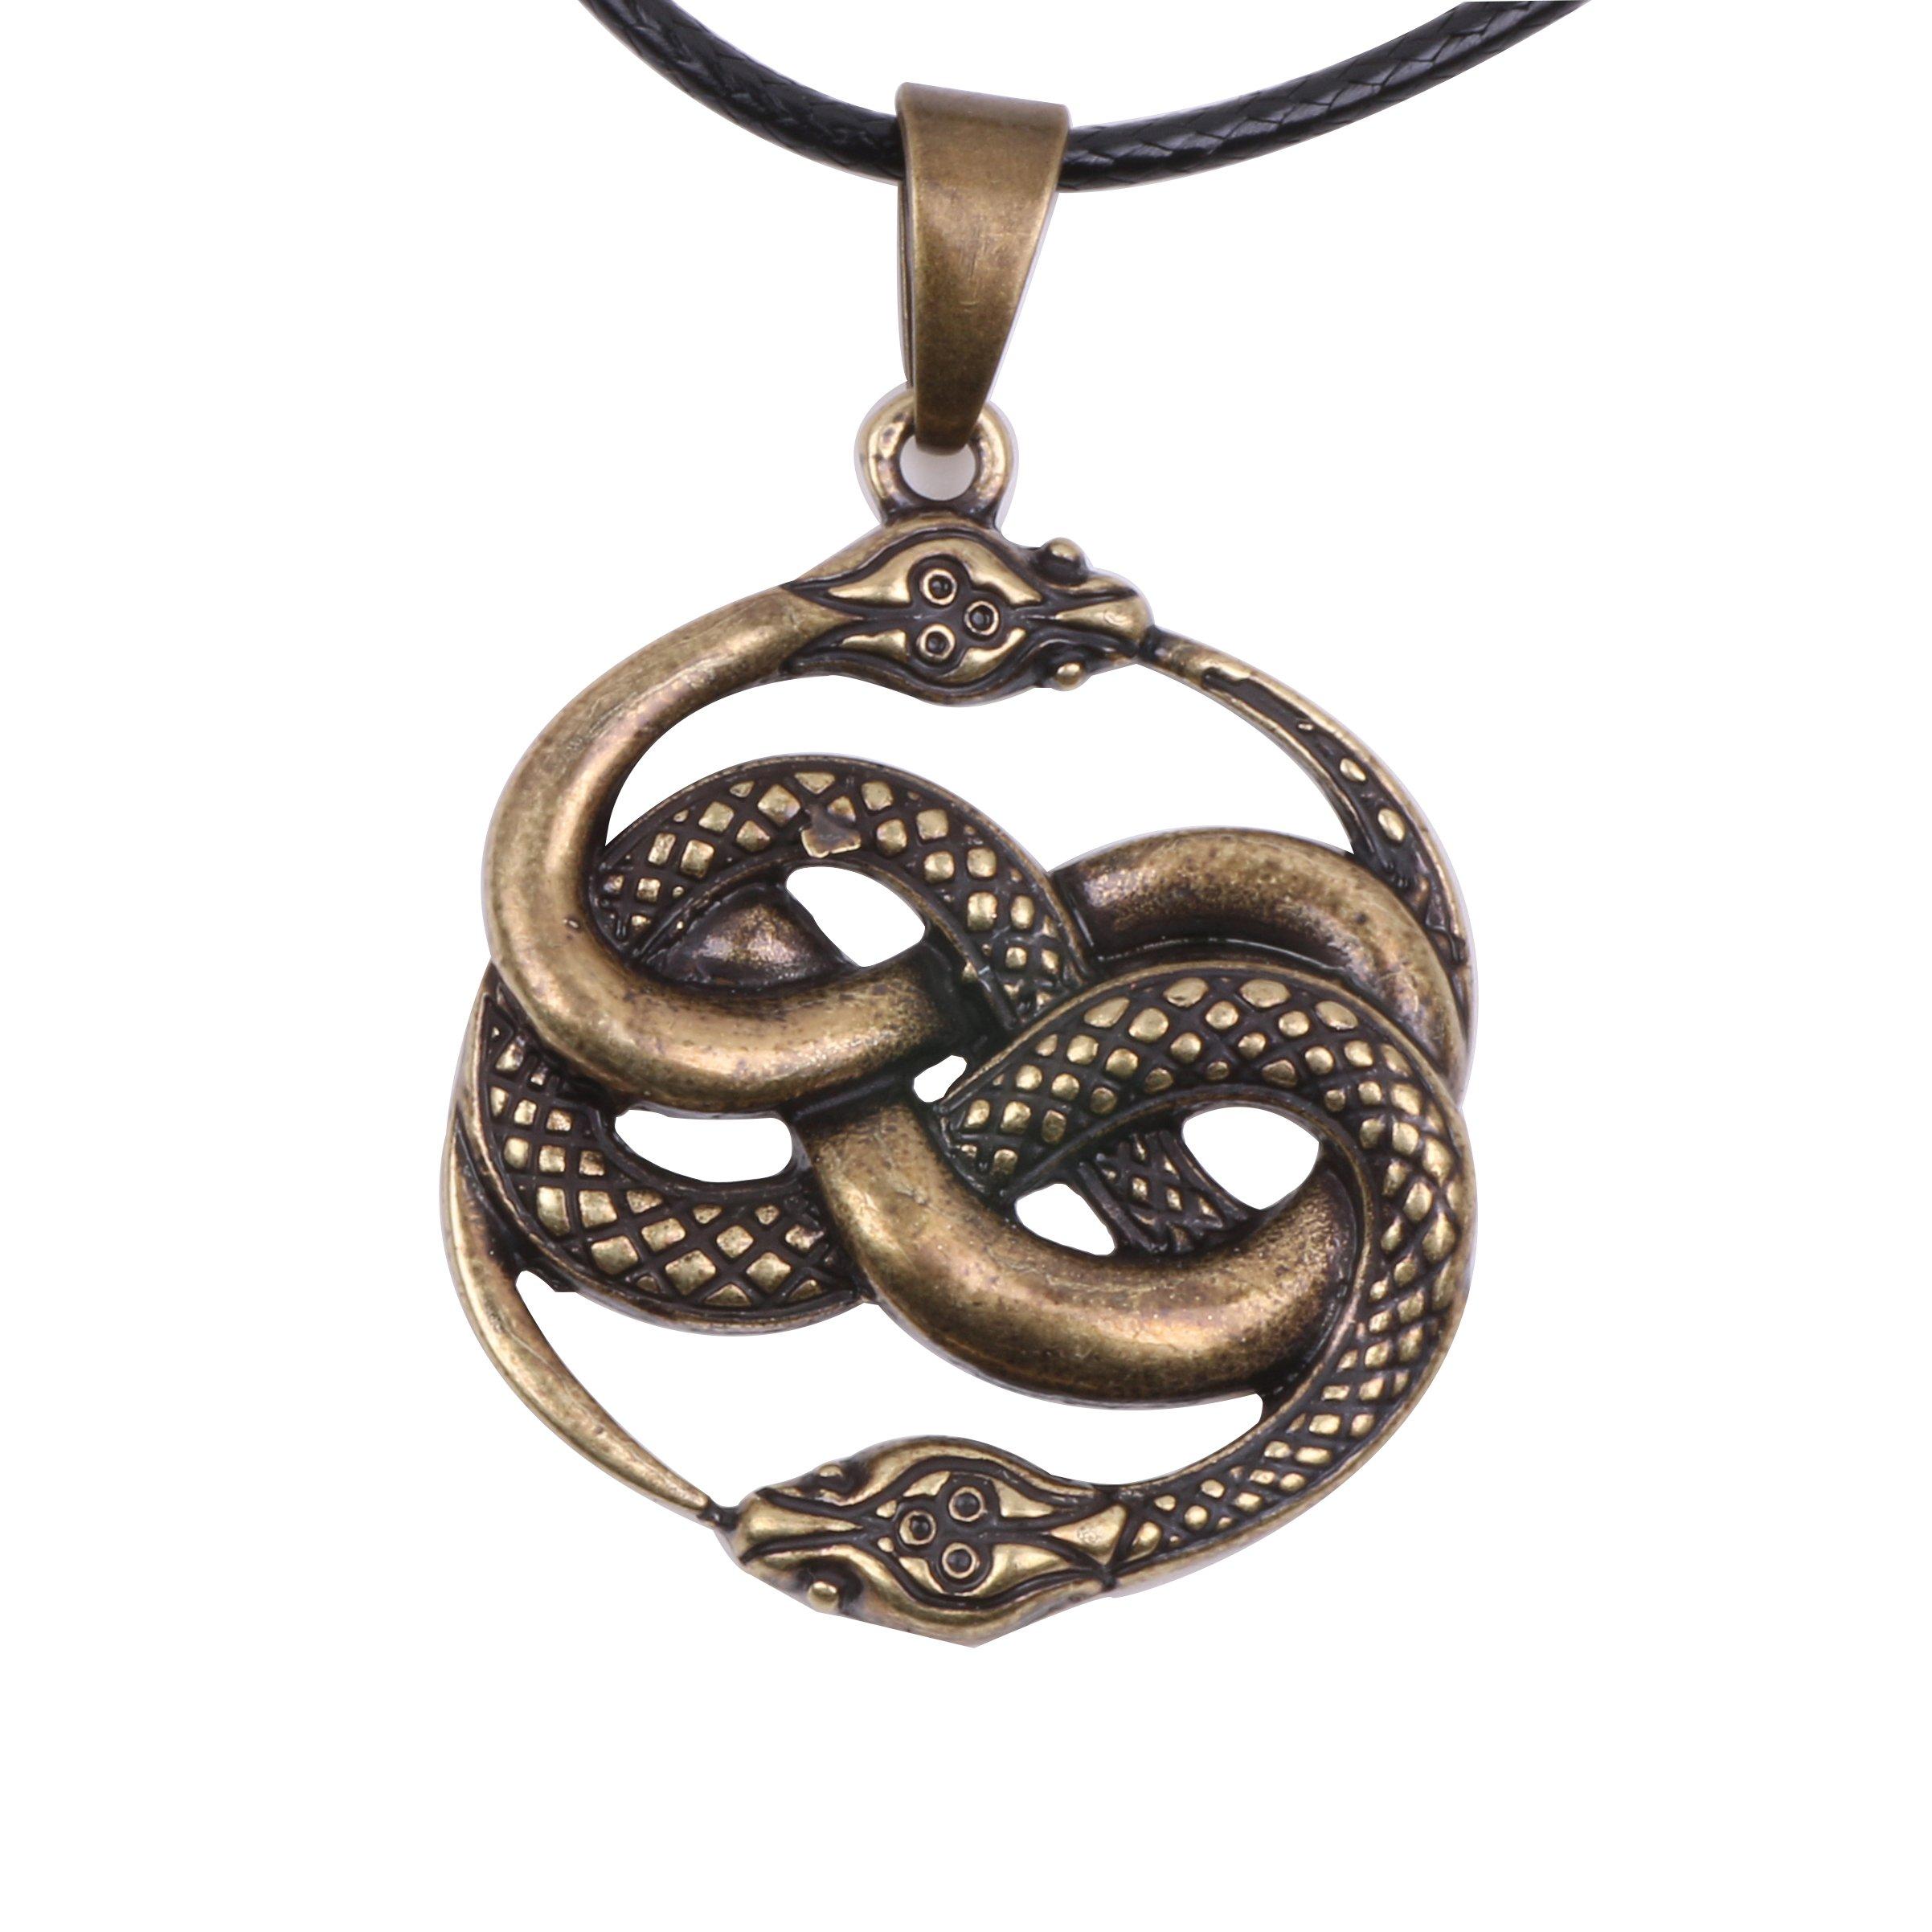 Paw Paw House Knotwork Ouroboros Amulet Necklace Norse Viking Snake Runes Nordic Talisman Pagan Wicca Spiritual Jewelry Men (4169 Bronze)